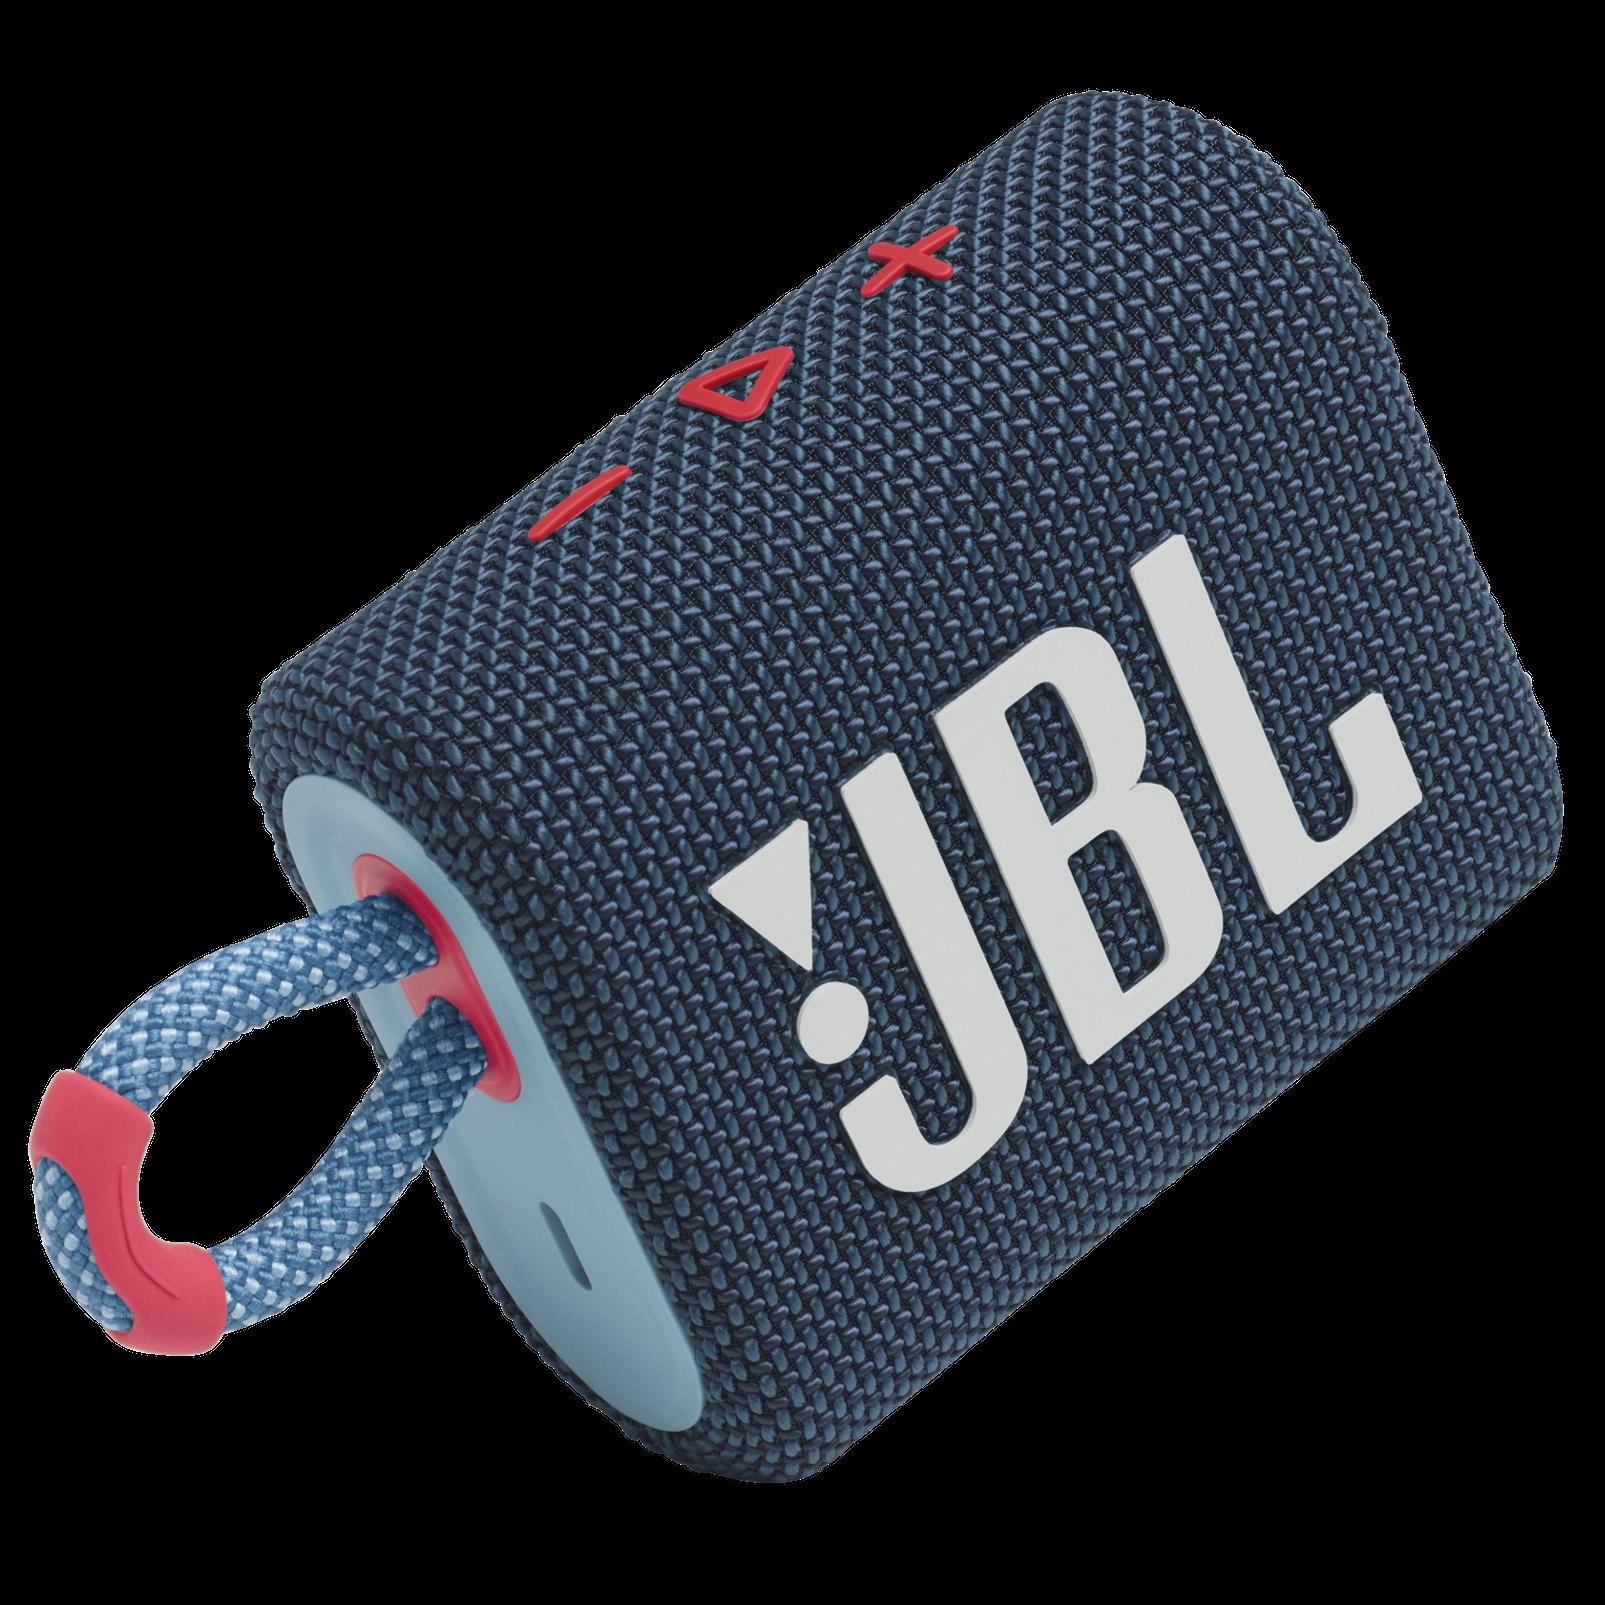 JBL Go 3 - Blue / Pink - Portable Waterproof Speaker - Detailshot 1